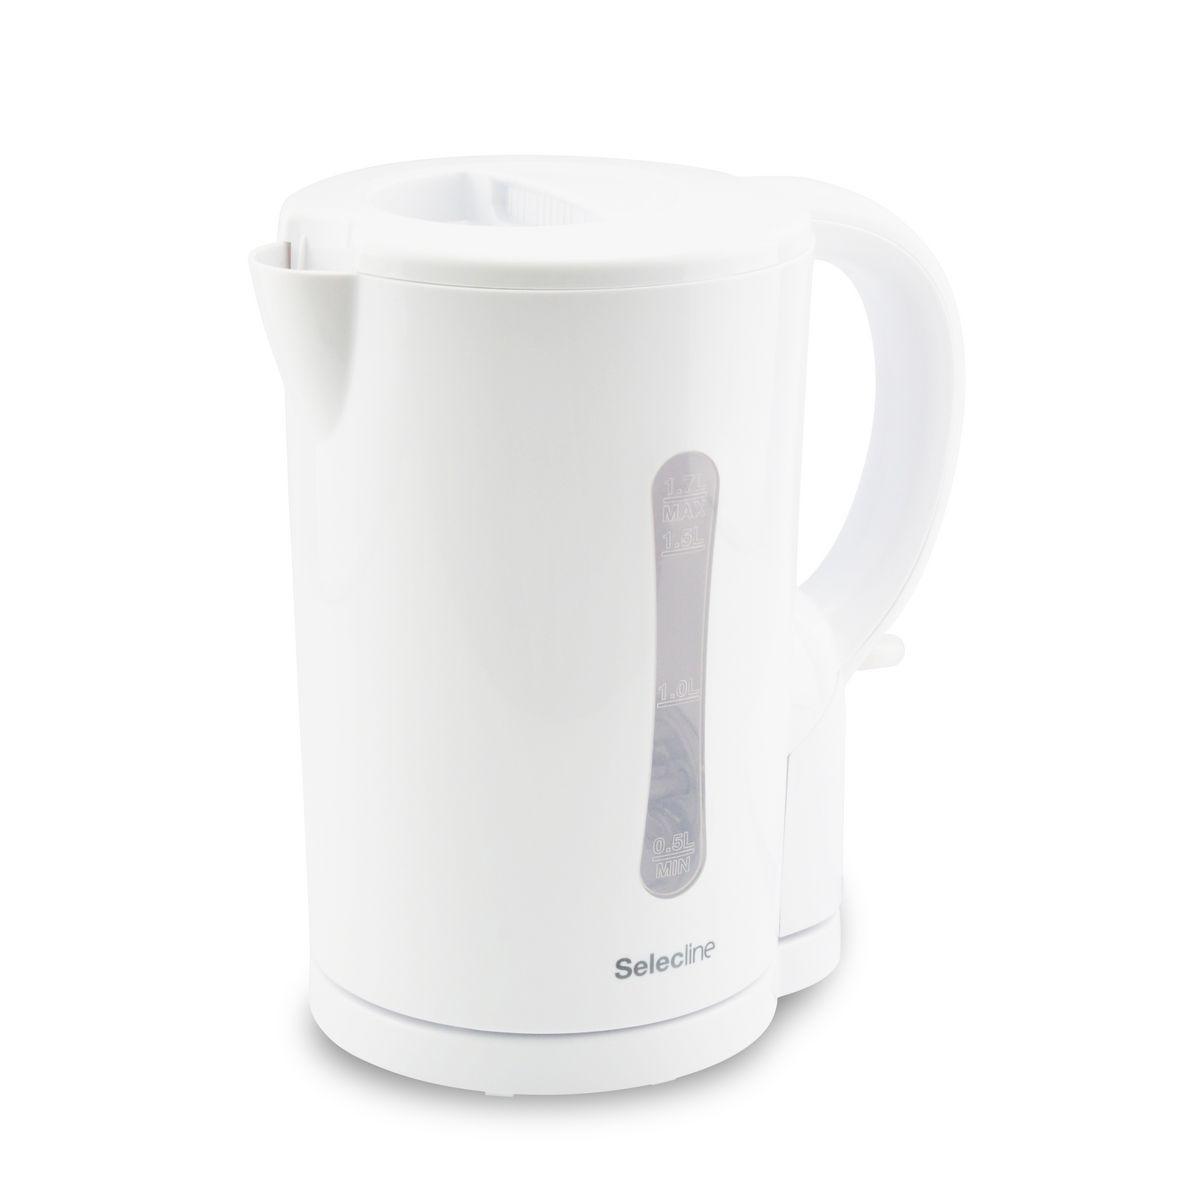 Bouilloire Electric Kettle KE01101C-GS blanche